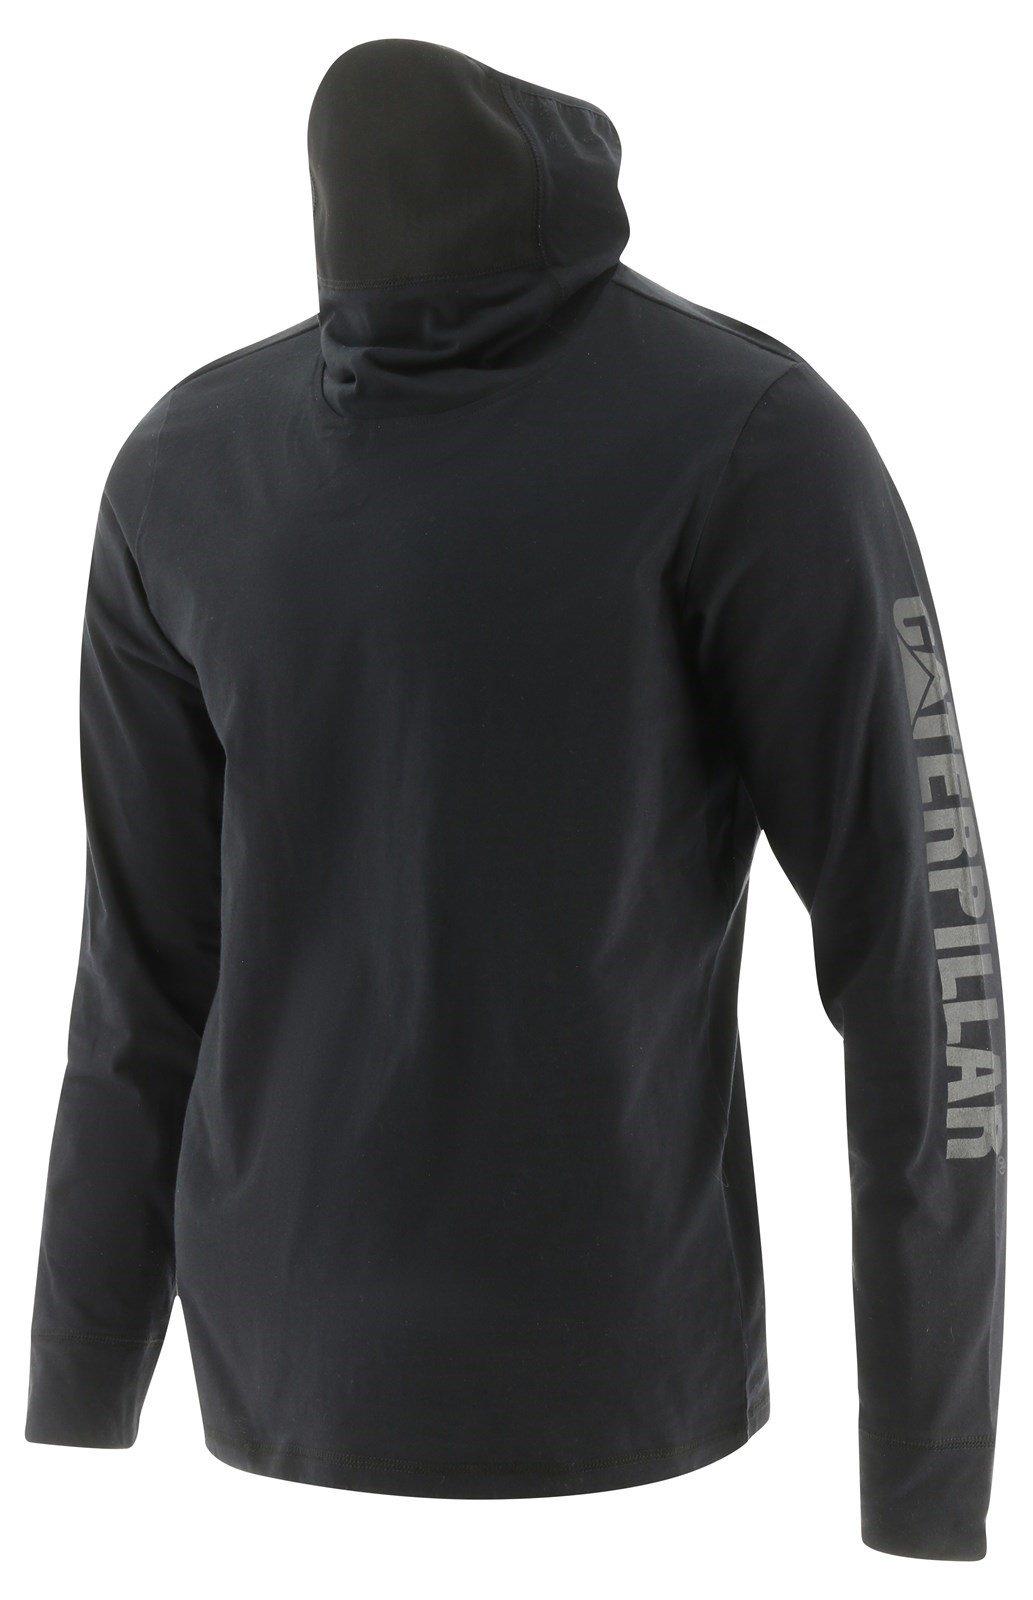 Caterpillar Unisex Viraloff LS Gaiter T-Shirts Black 32507 - Black Sml